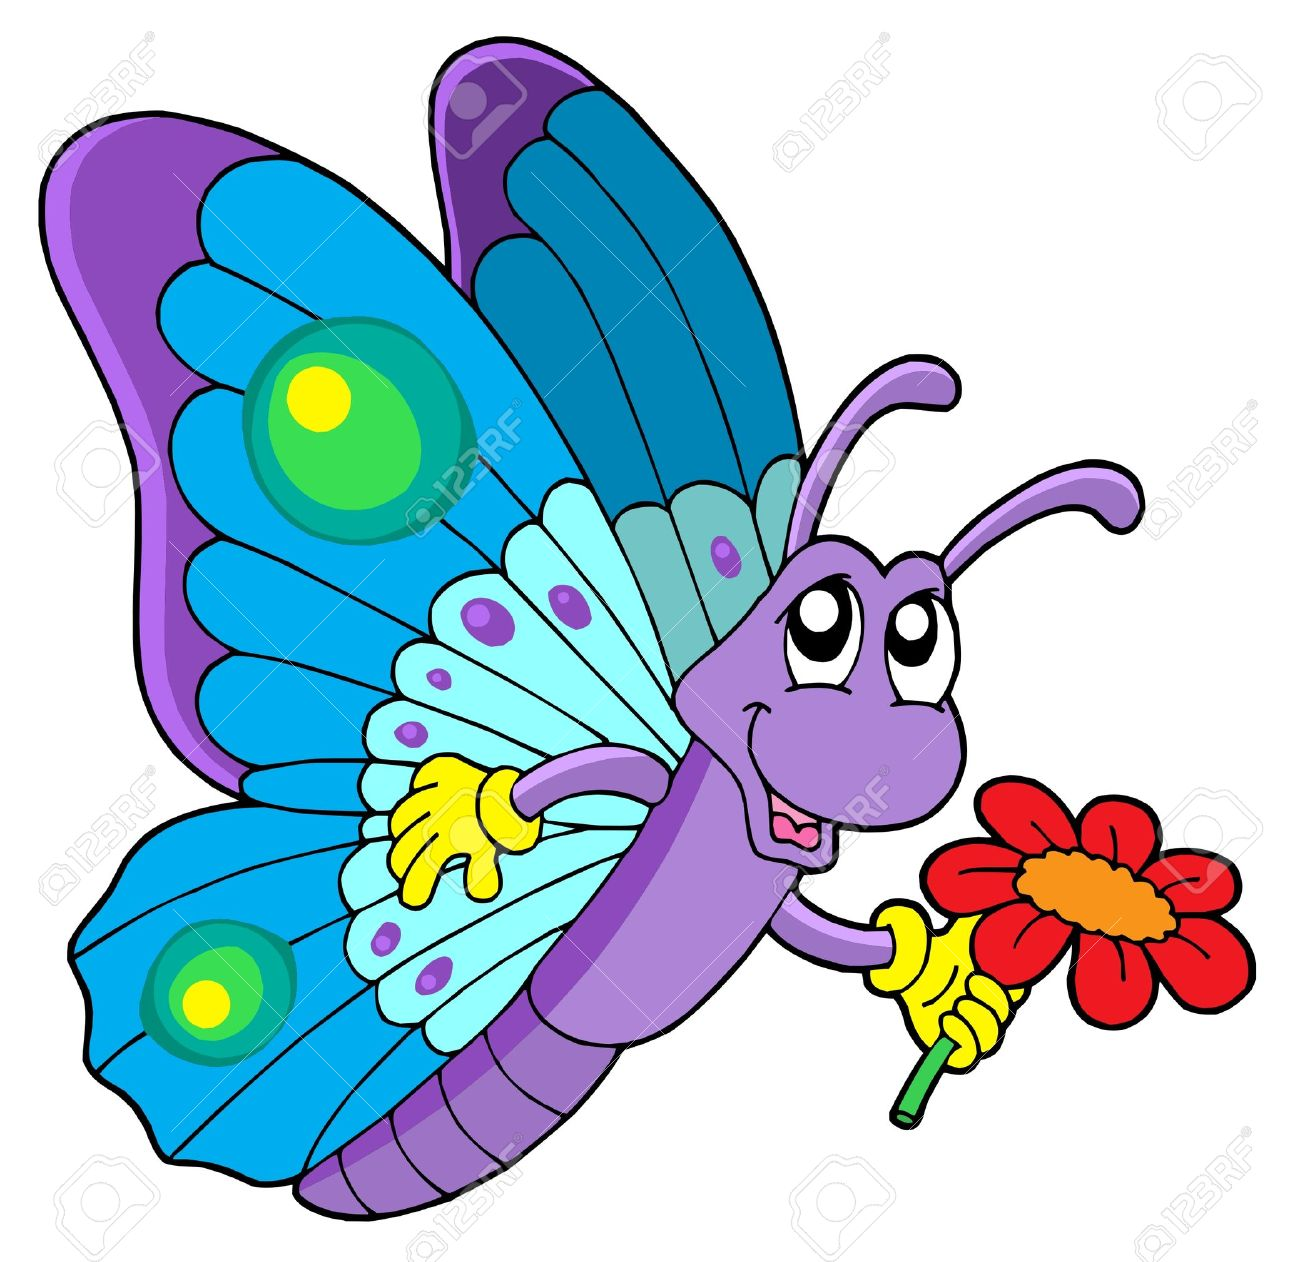 Cute butterfly holding flower - vector illustration. Stock Vector - 3394947